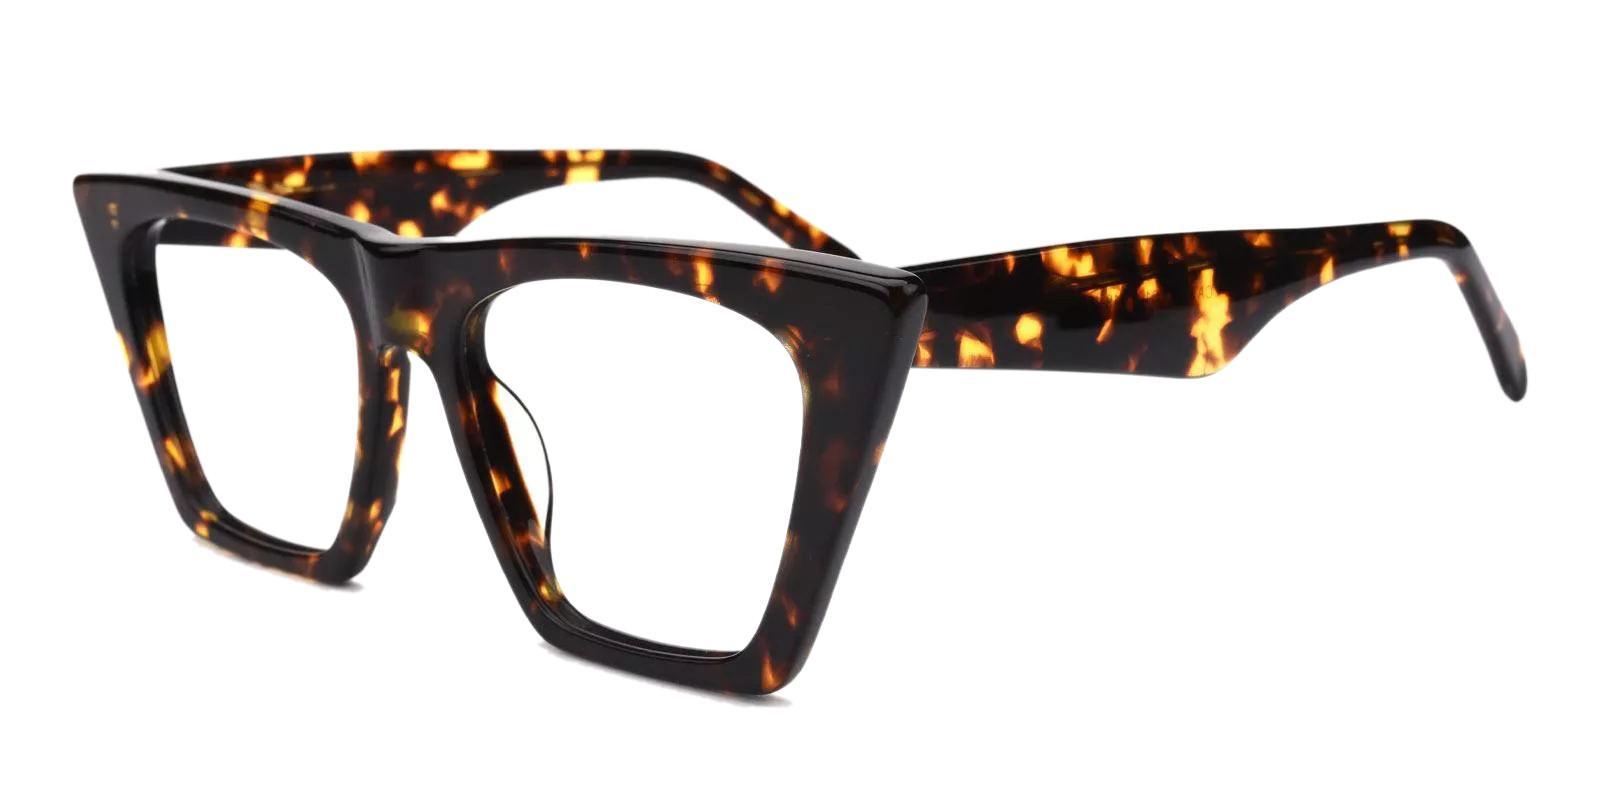 Haley Tortoise Acetate Eyeglasses , Fashion , UniversalBridgeFit Frames from ABBE Glasses